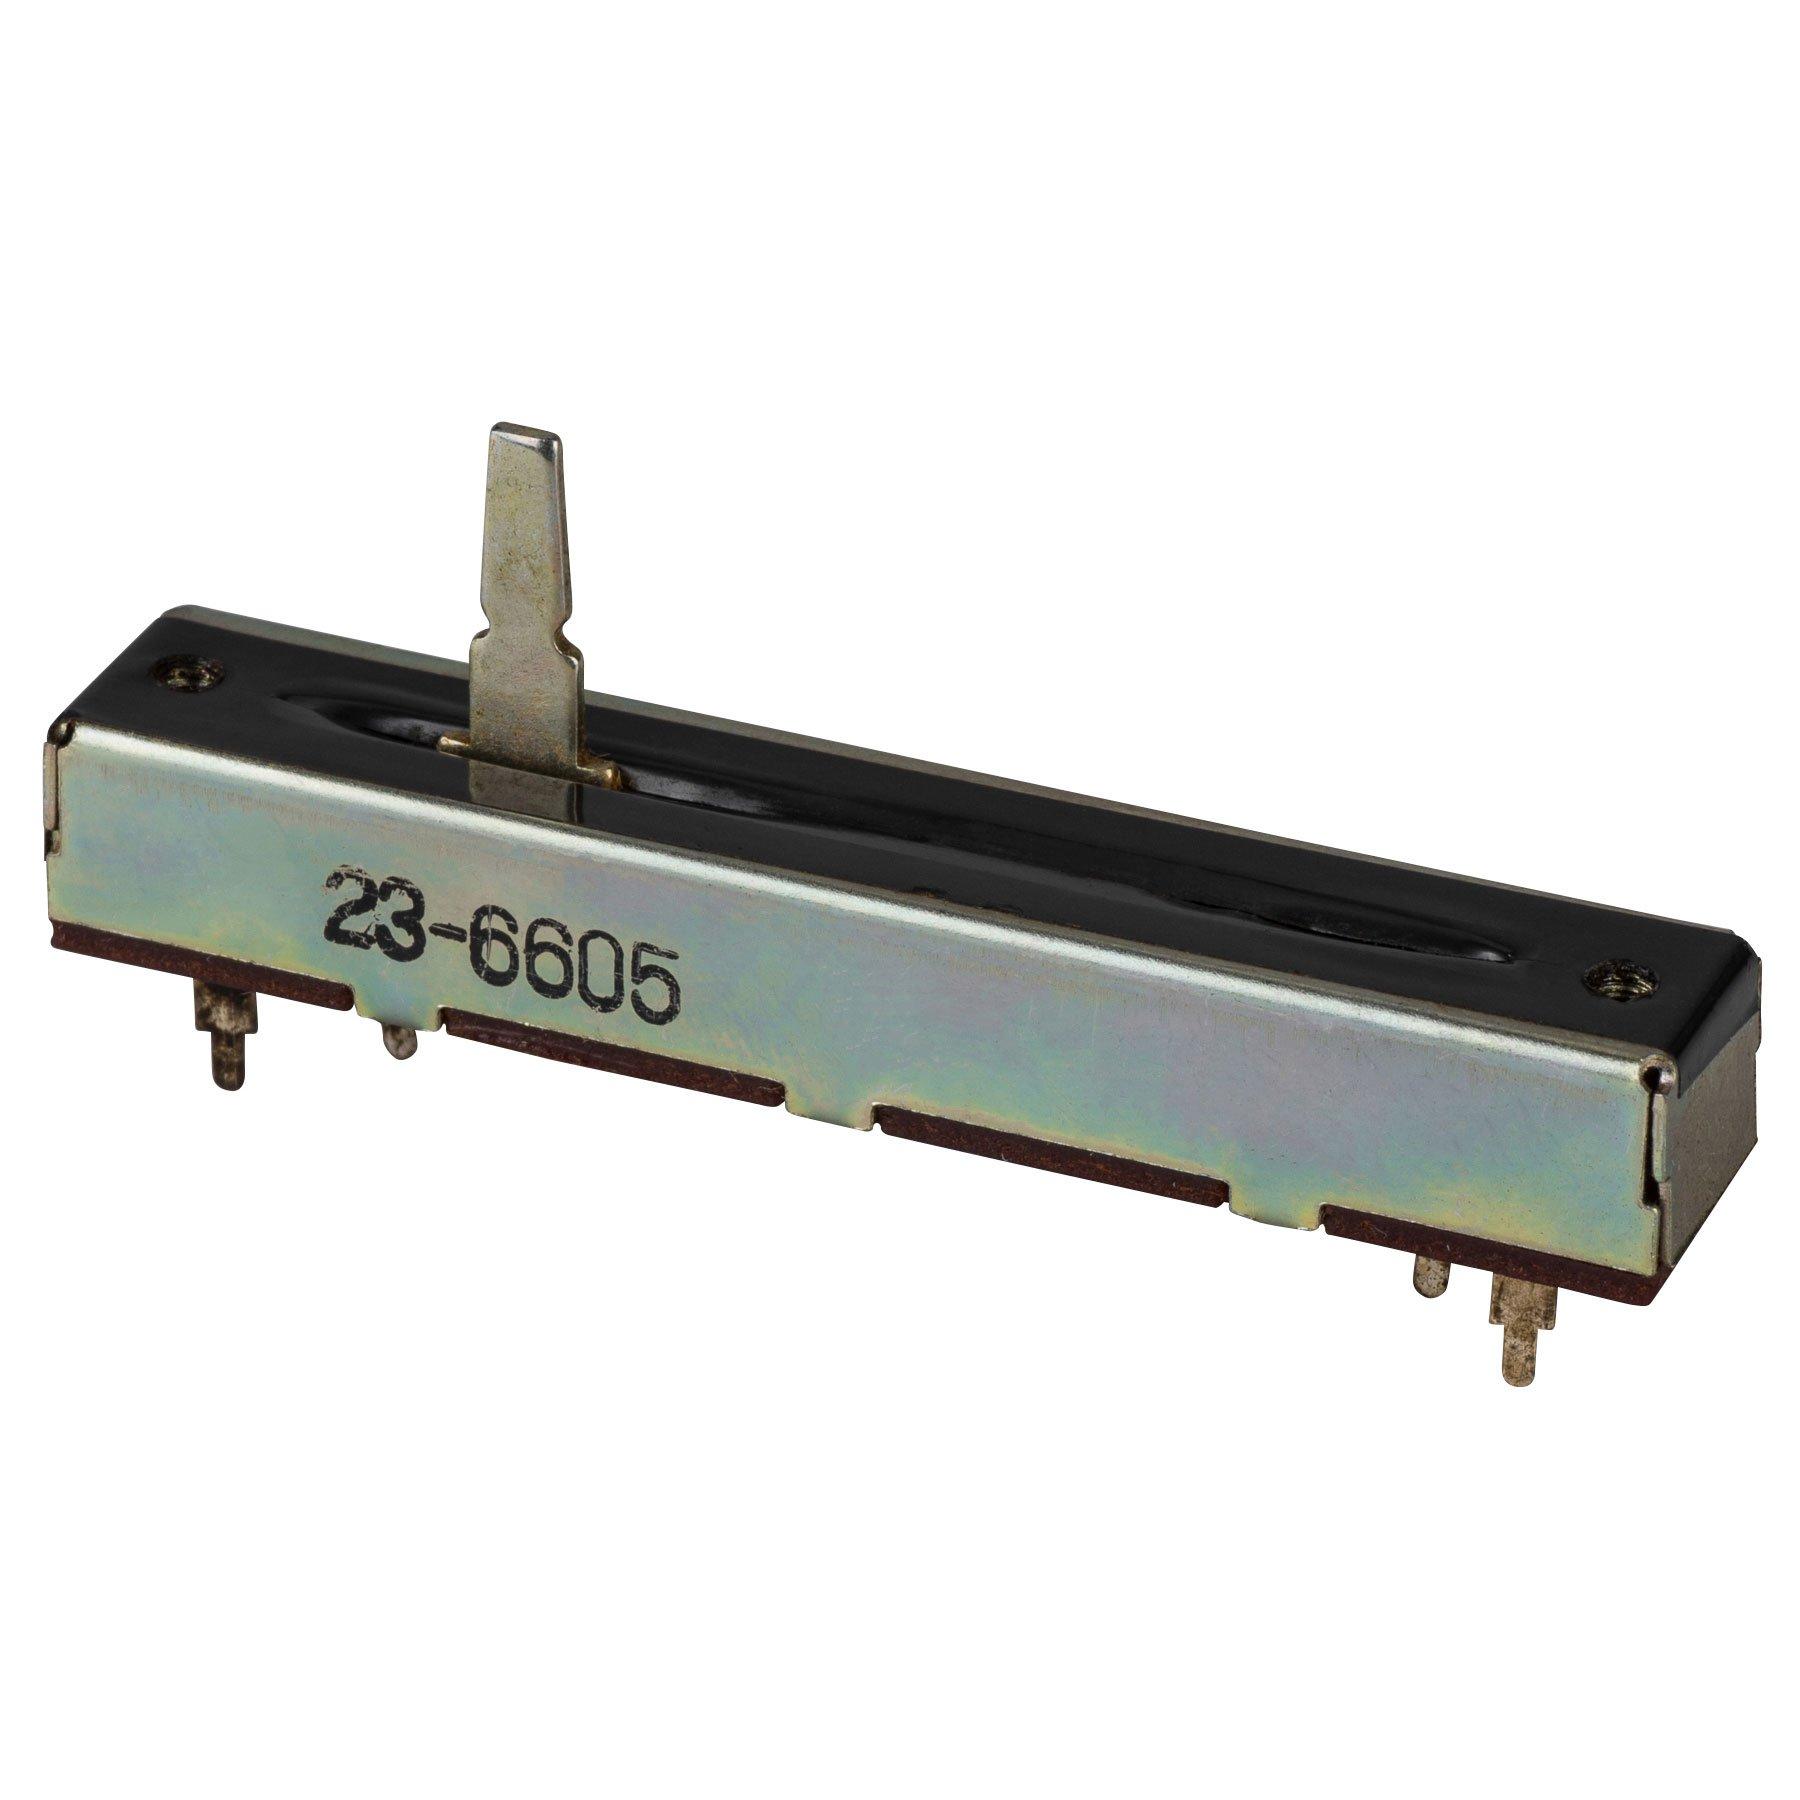 B25K 25K Ohms Slide Potentiometer 2'' Travel with Dust Cover